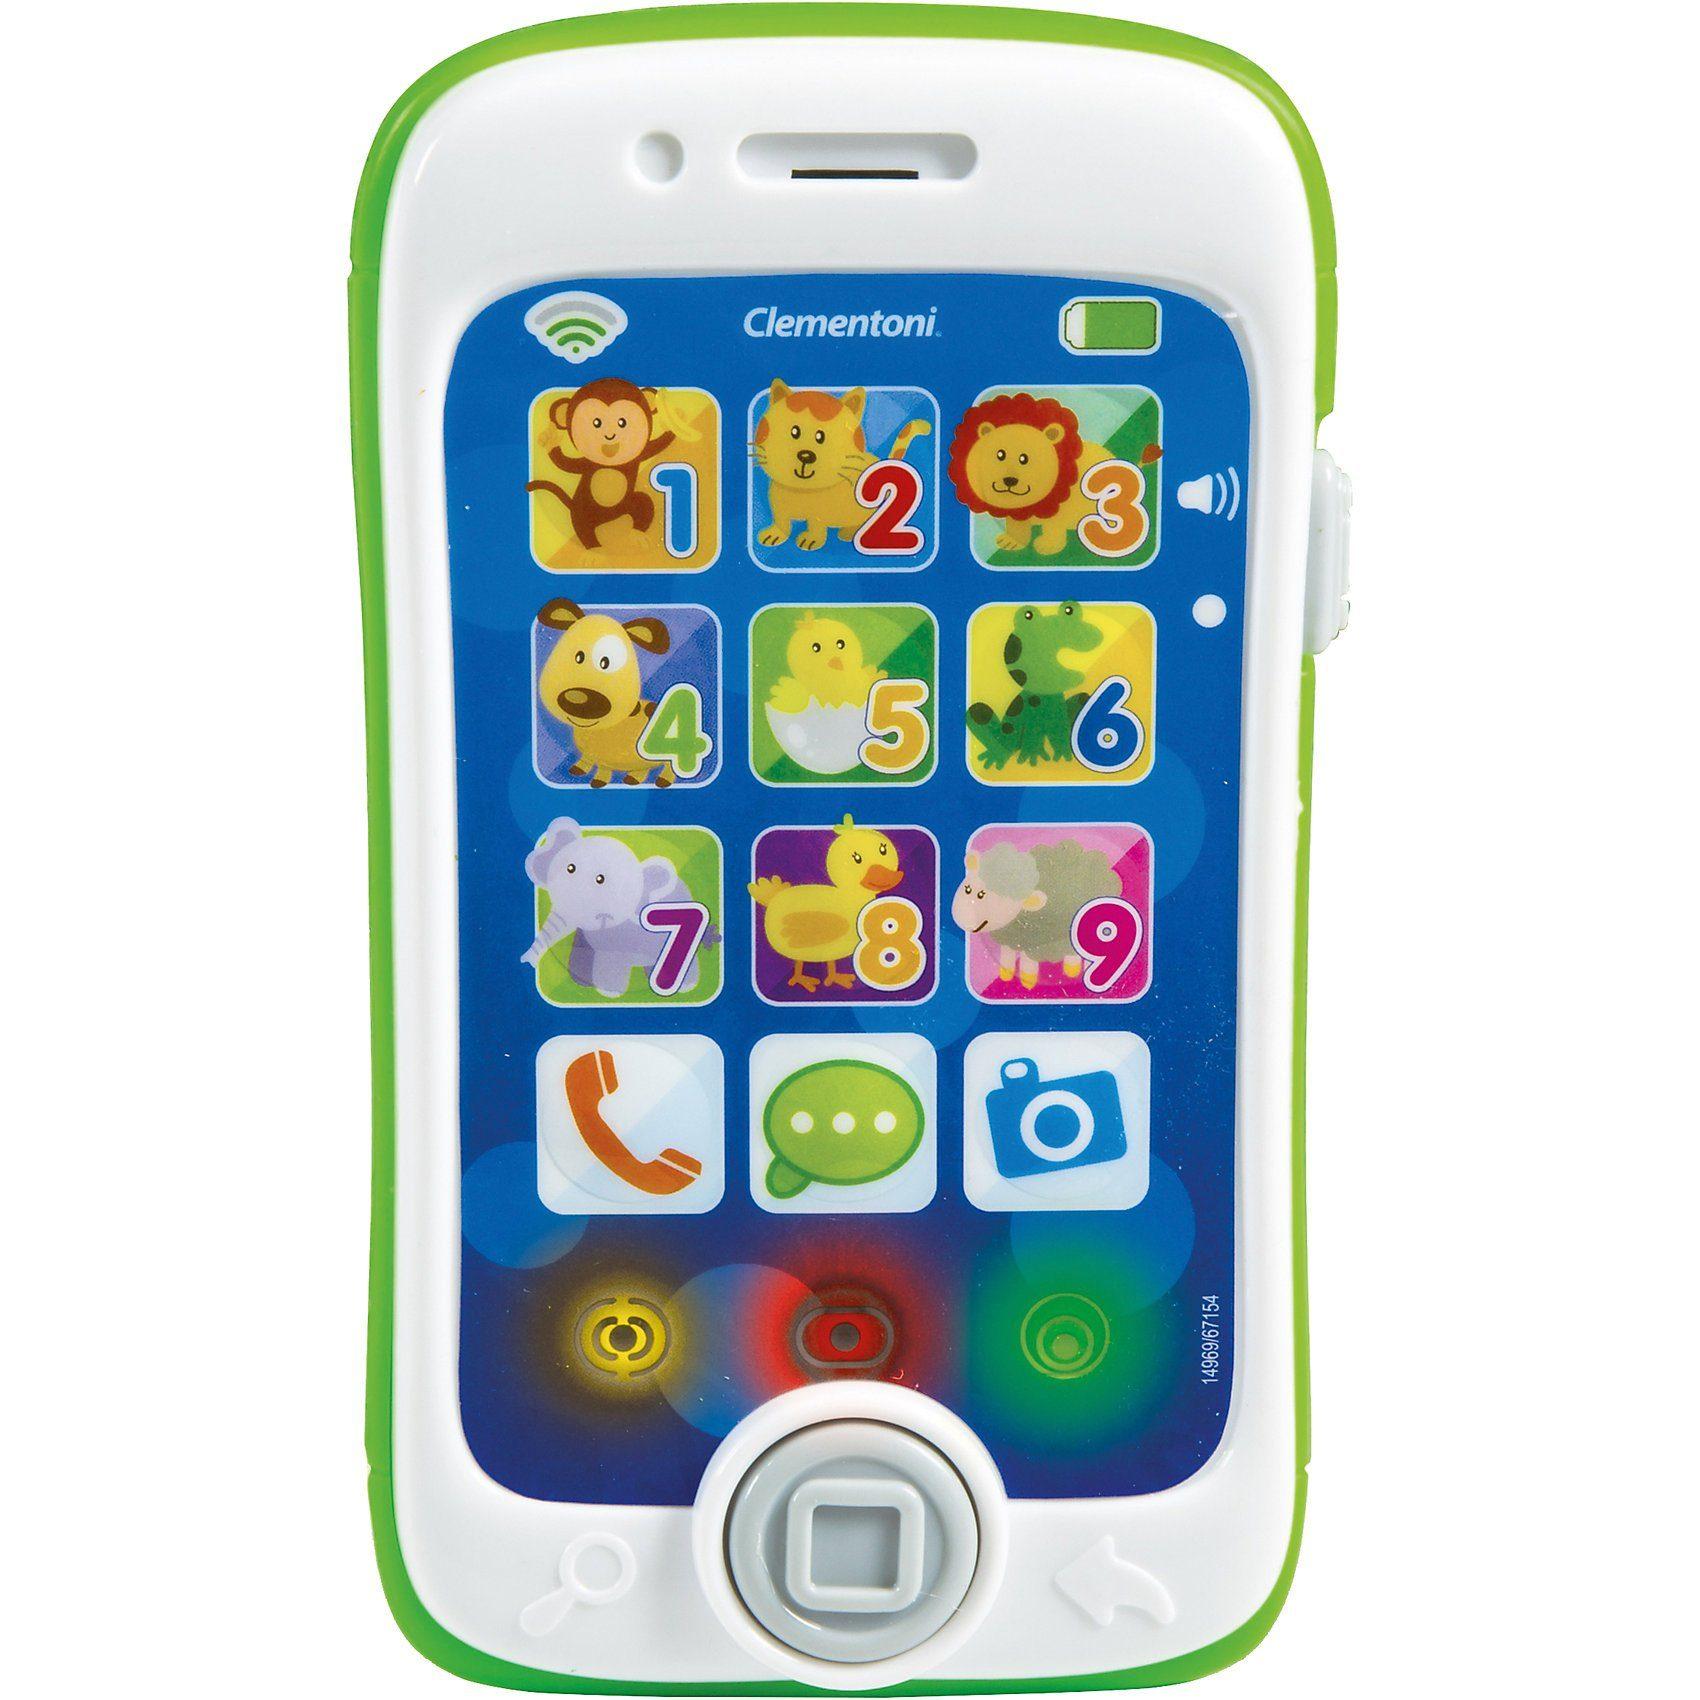 Clementoni® Smartphone Fun